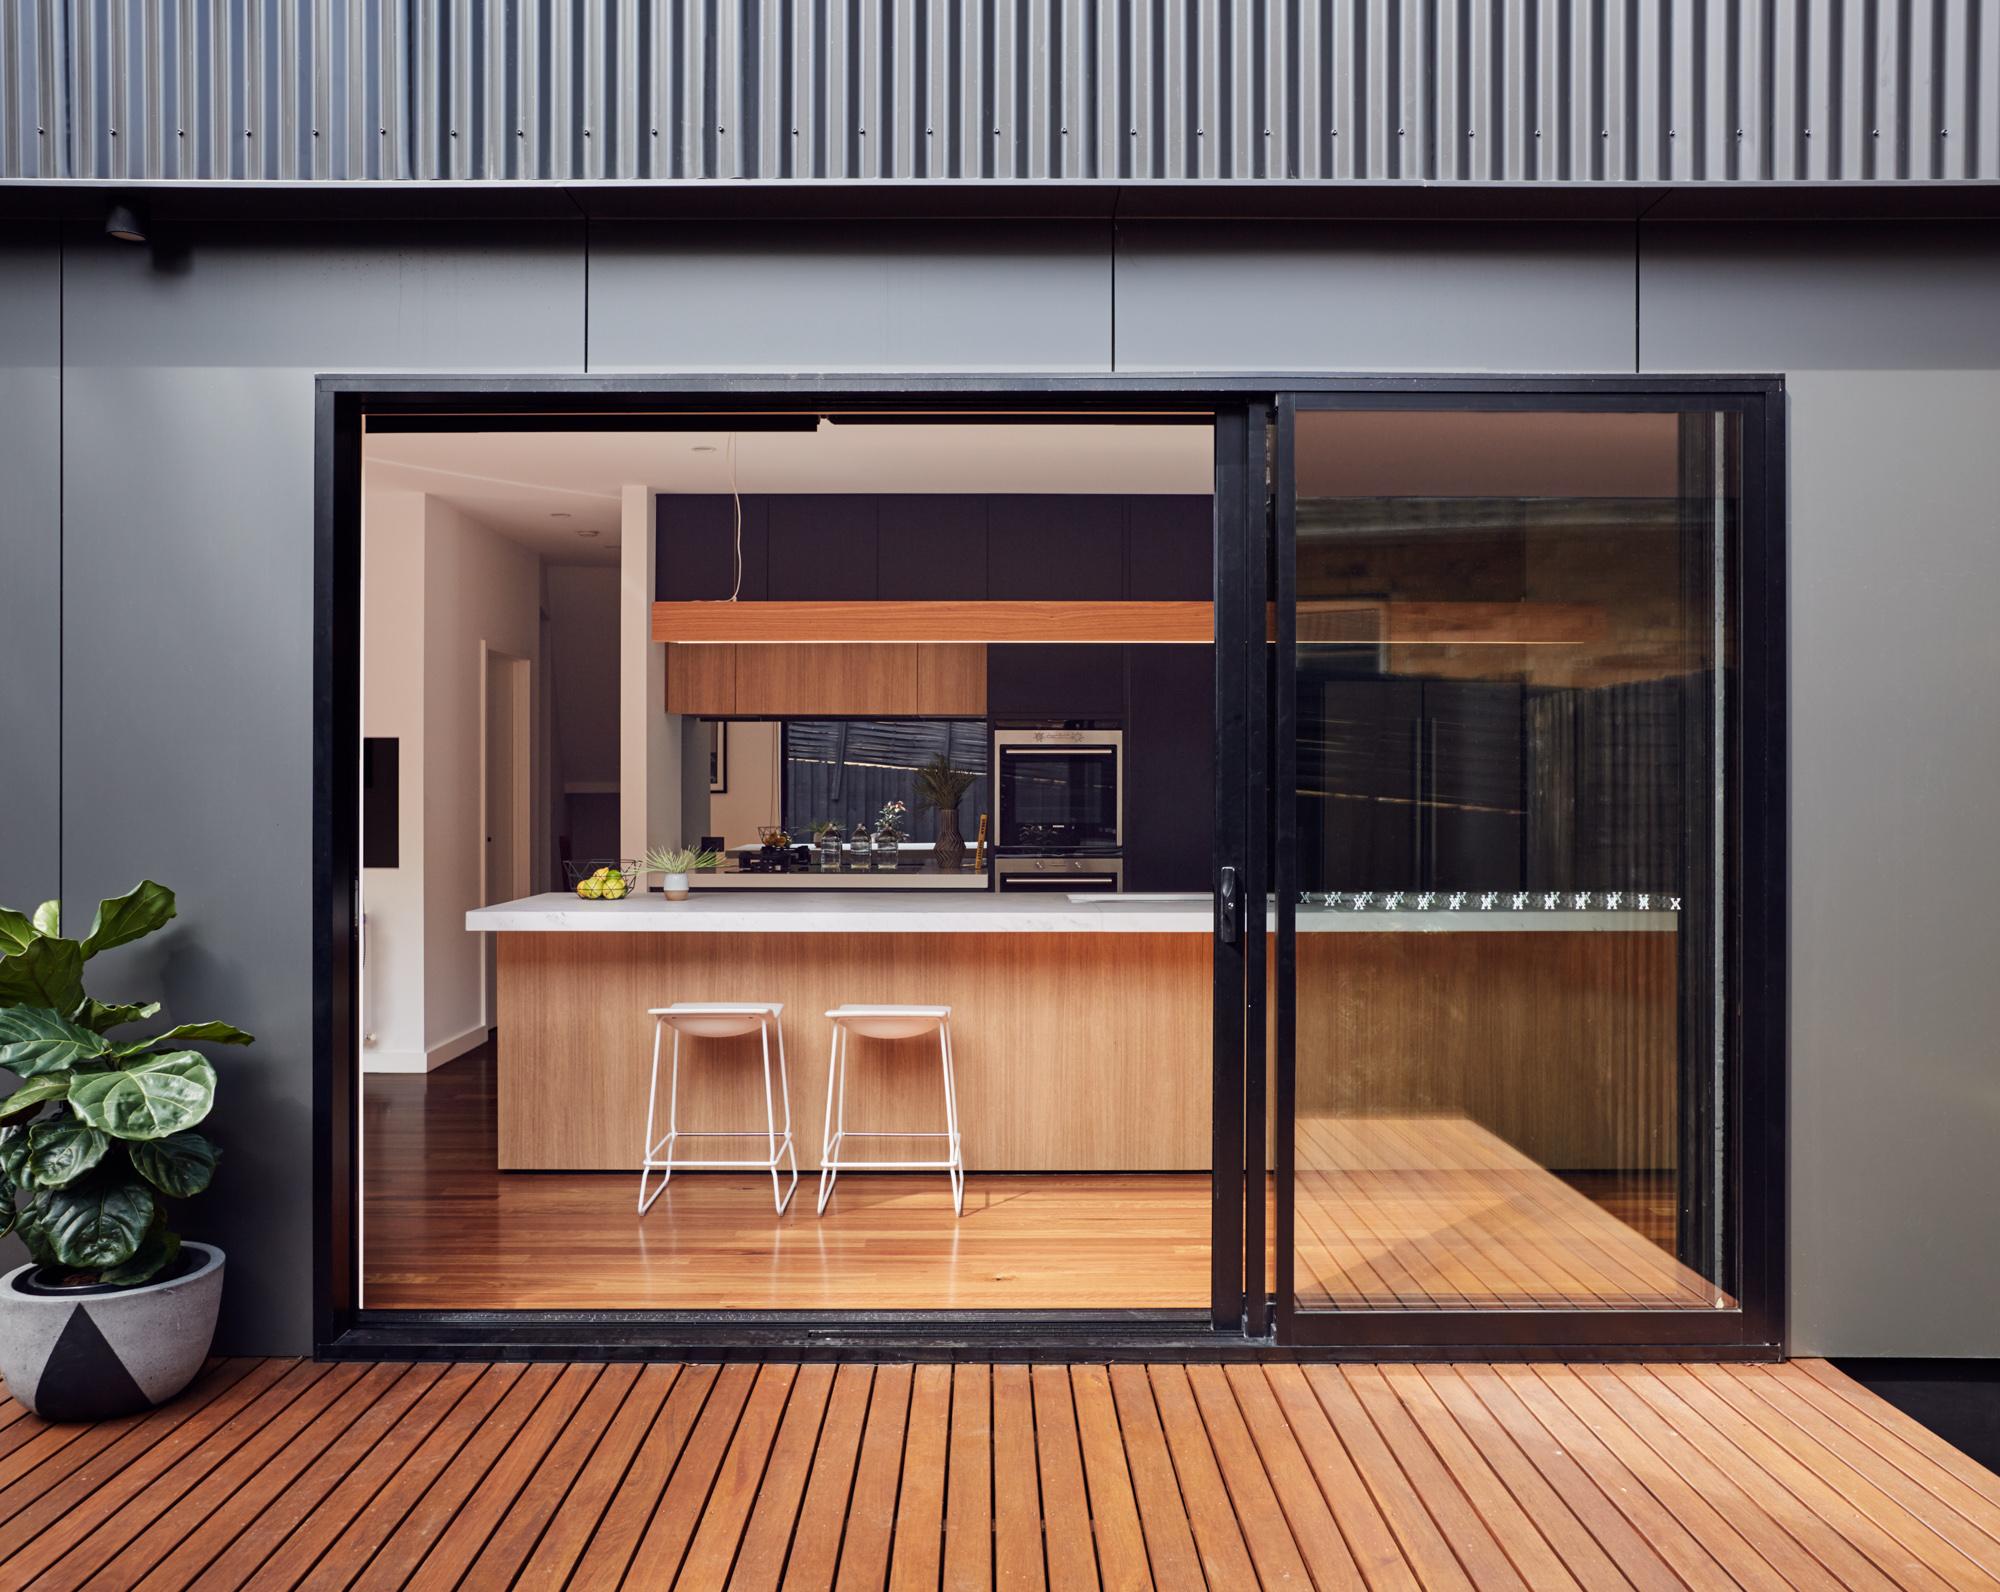 Gallery Of Blackburn House By Archiblox Local Australian Architecture & Design Blackburn, Vic Image 4